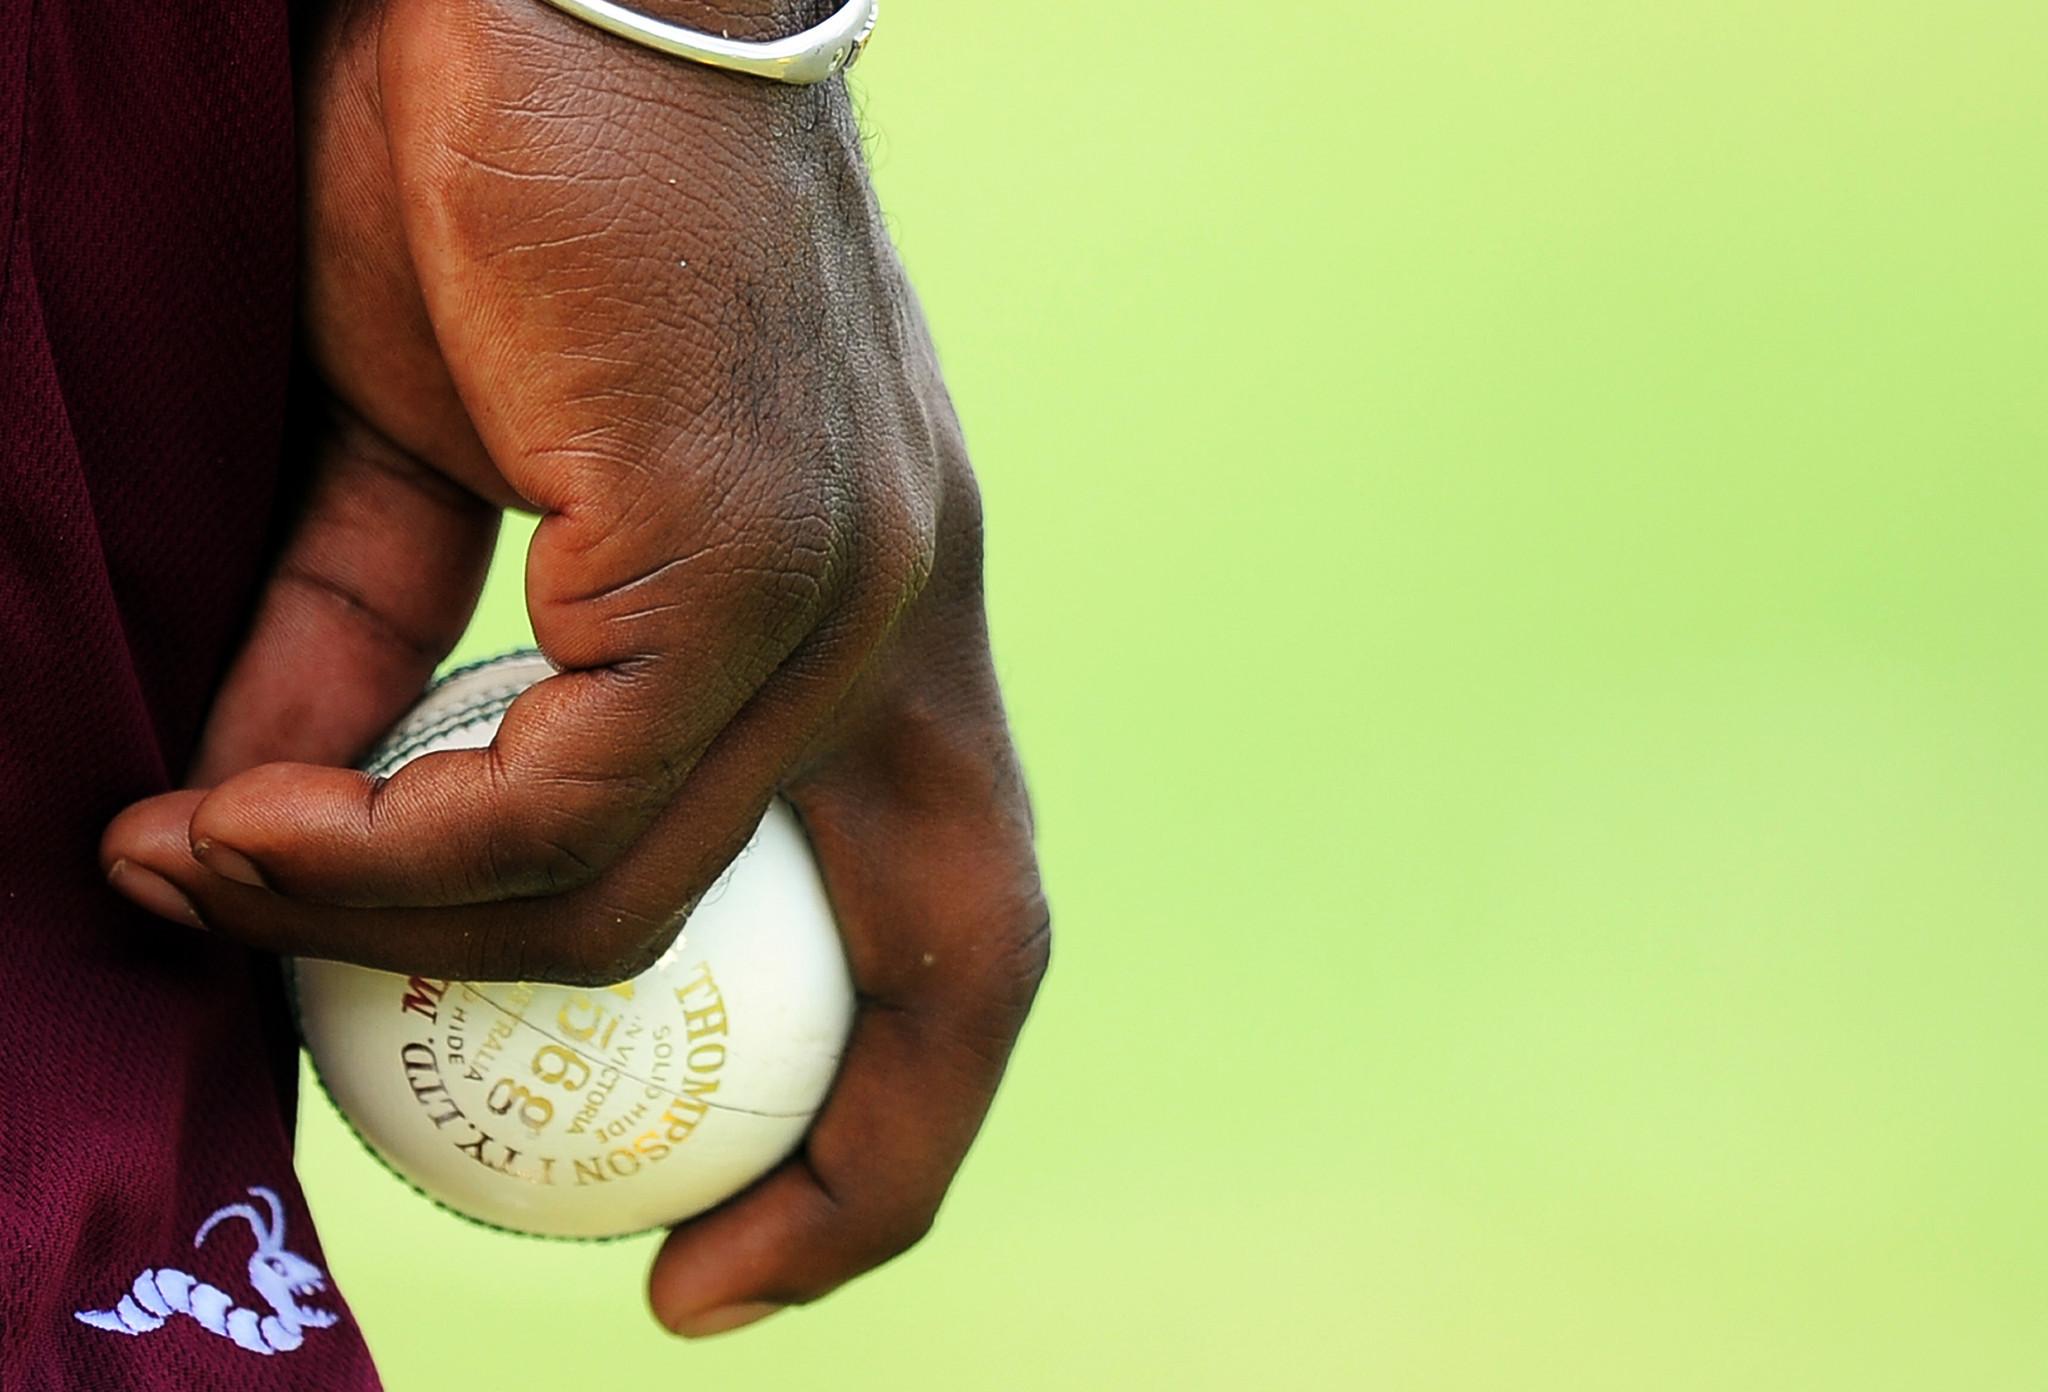 ICC postpone qualification events until end of June over coronavirus